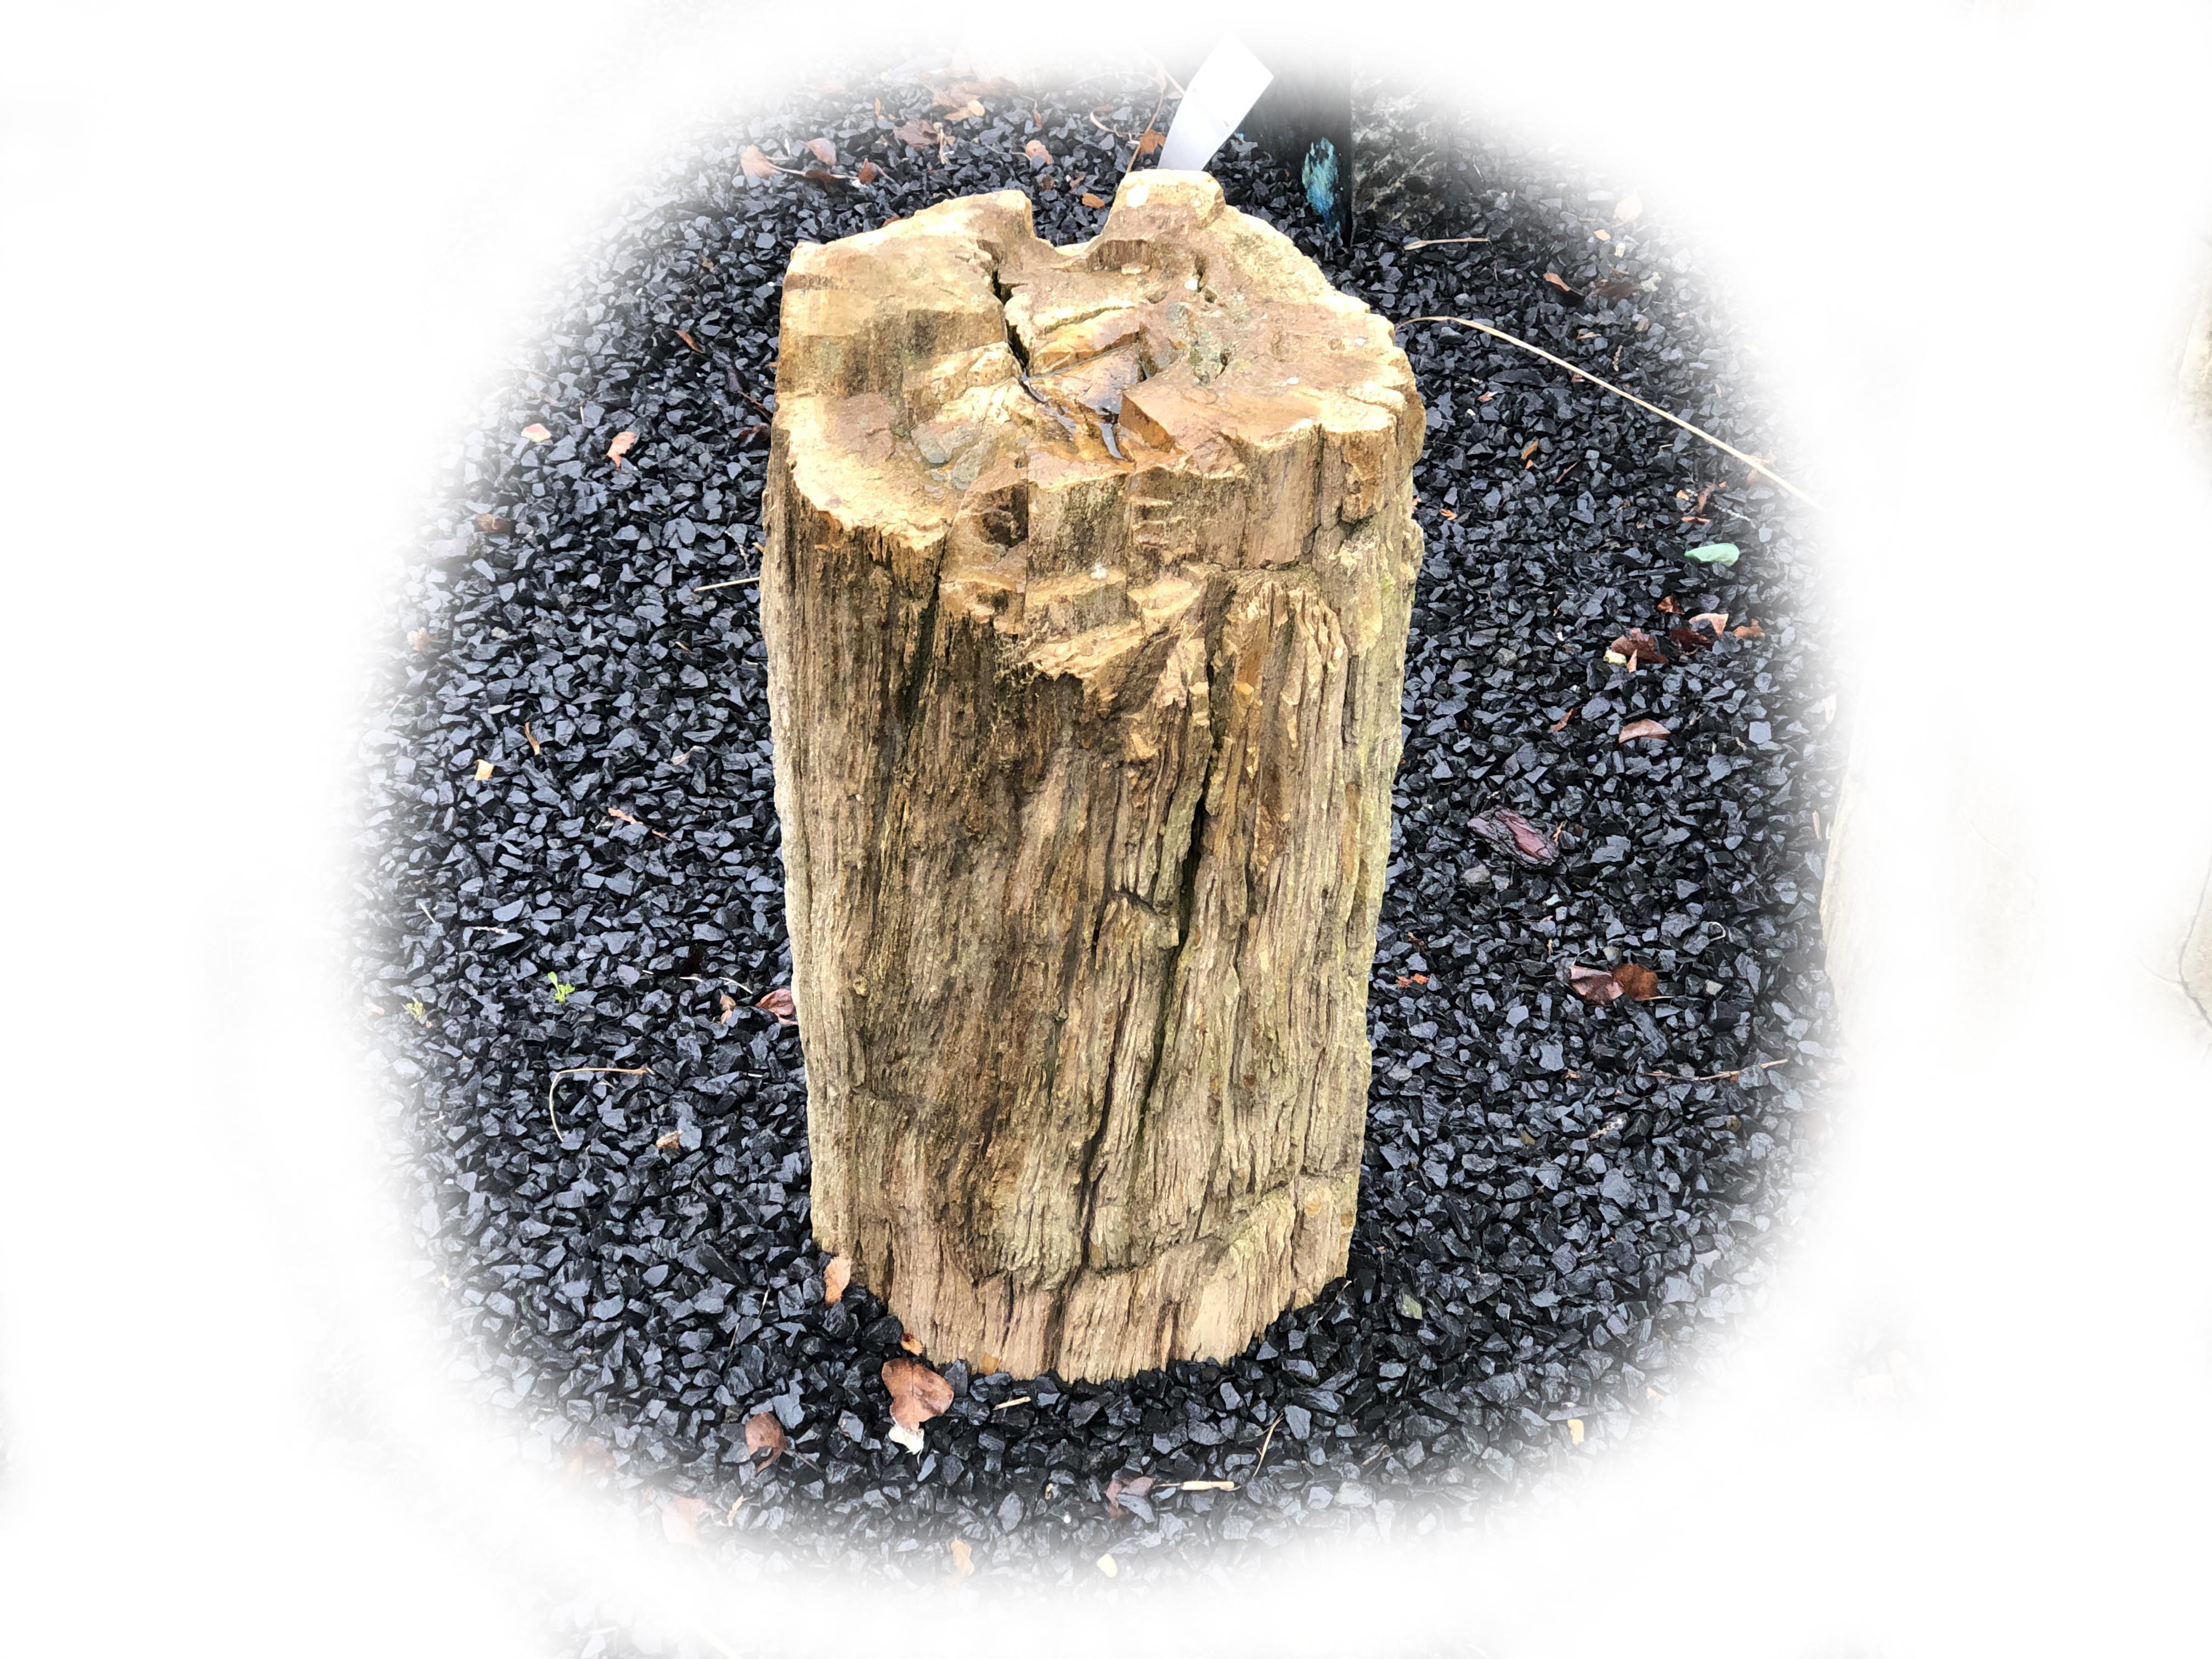 Versteend hout K-144